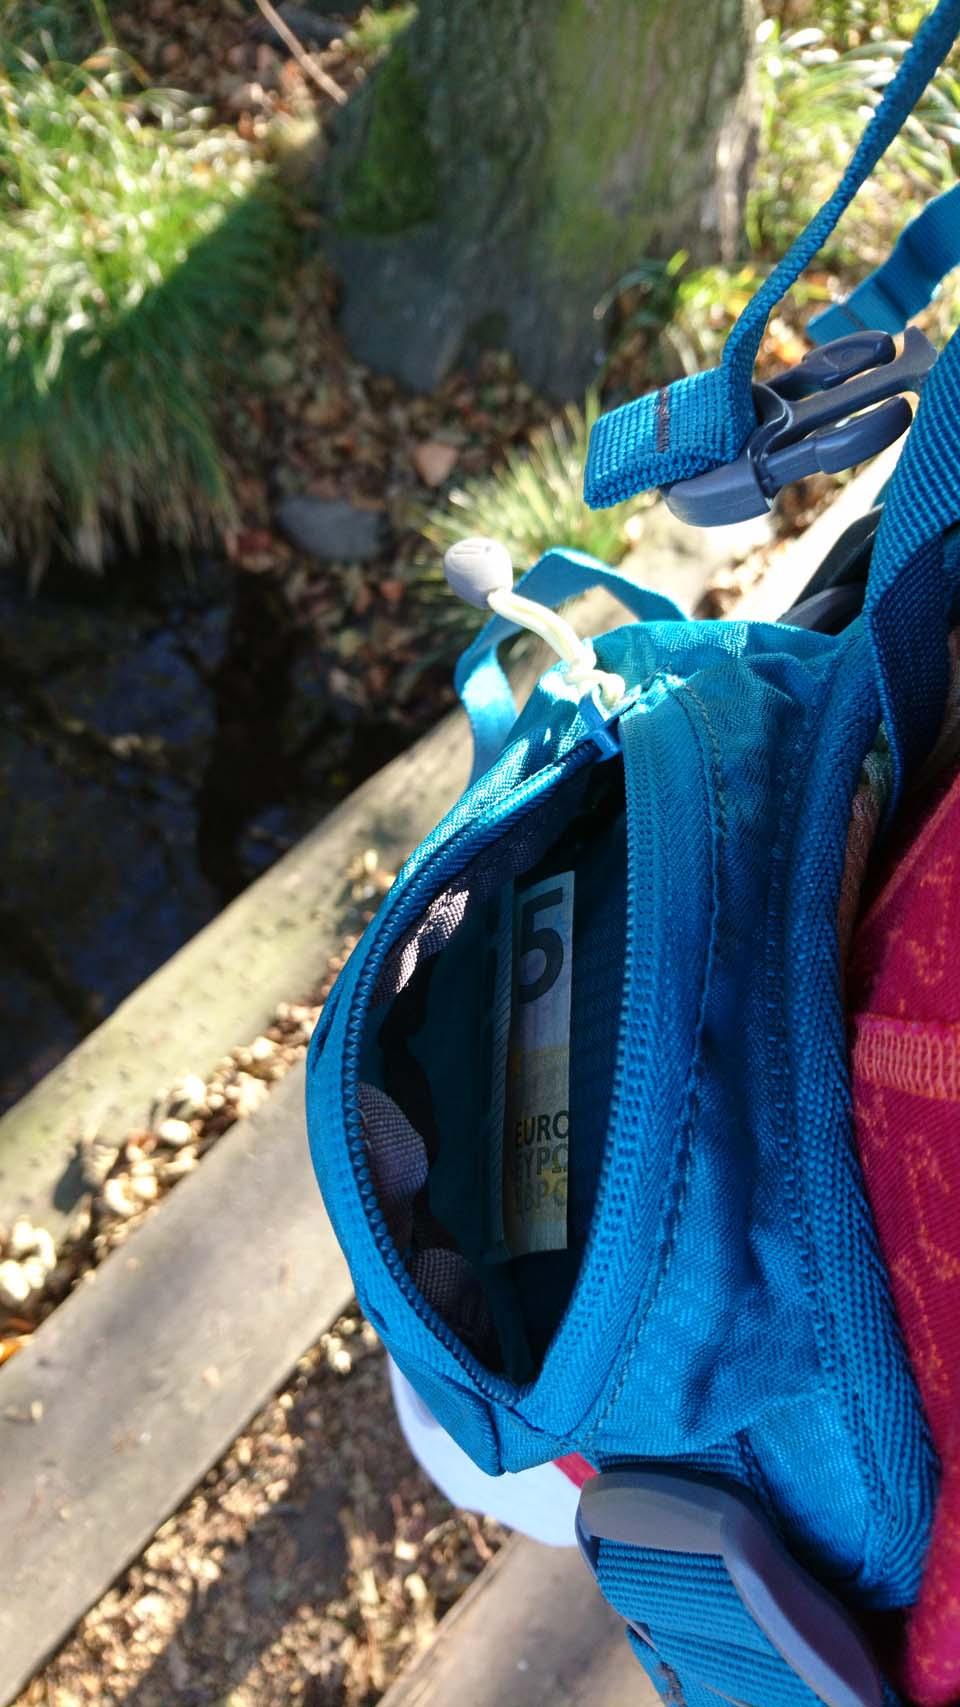 Vrecko na bedrovom popruhu Ferrino Finisterre 40 Lady - turistický batoh